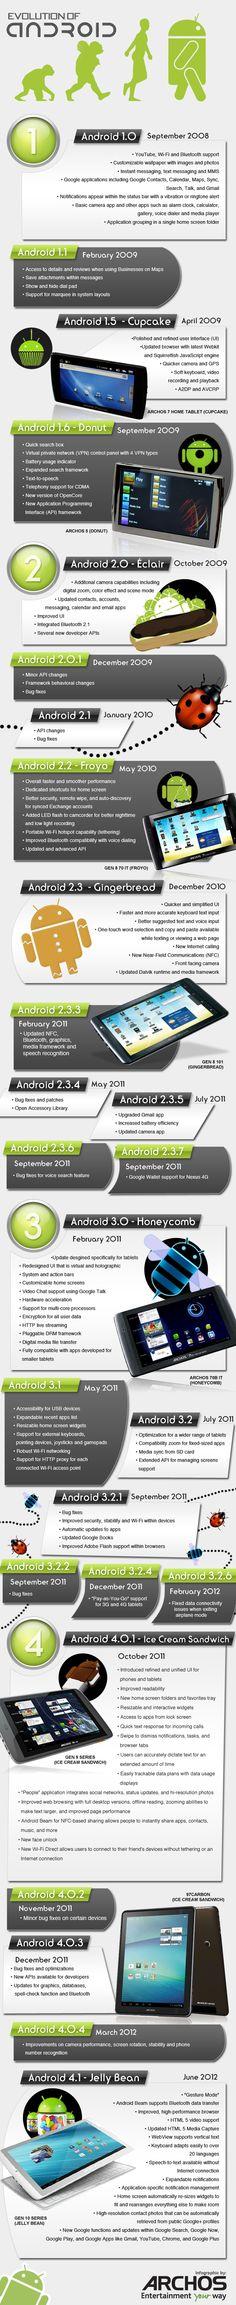 La evolución de Android #infografia #infographic #software #android